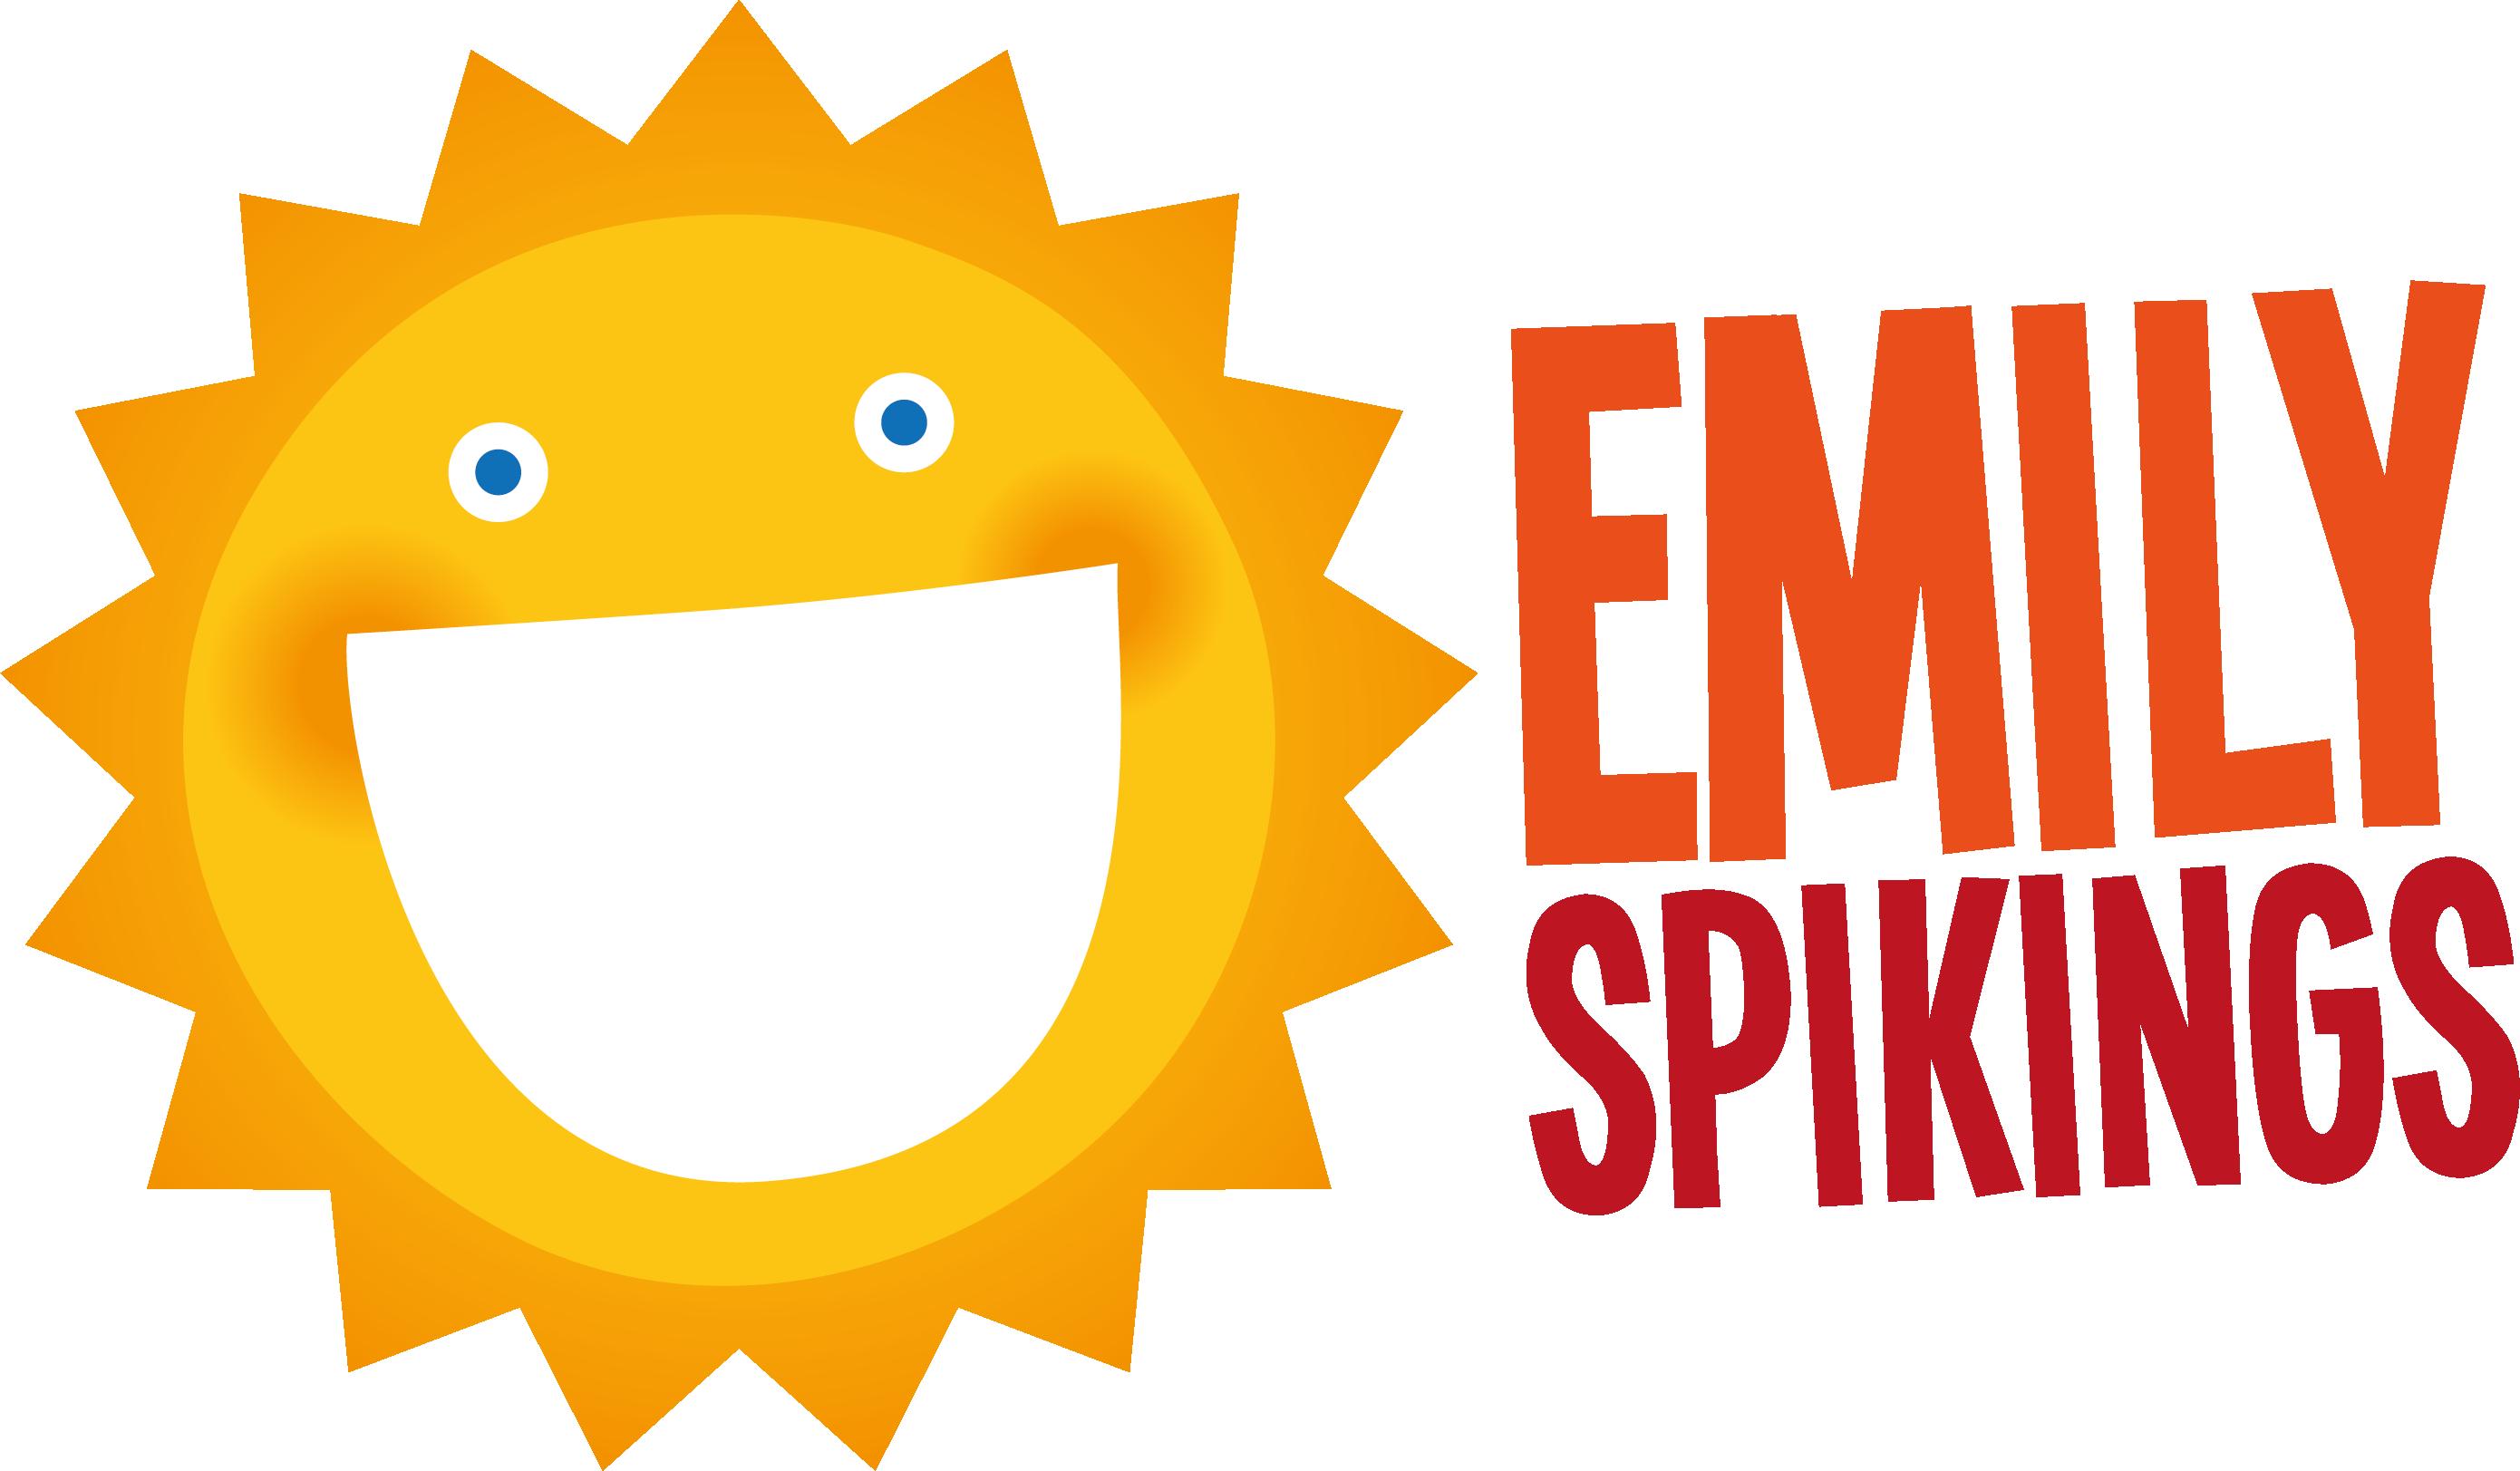 emily spikings